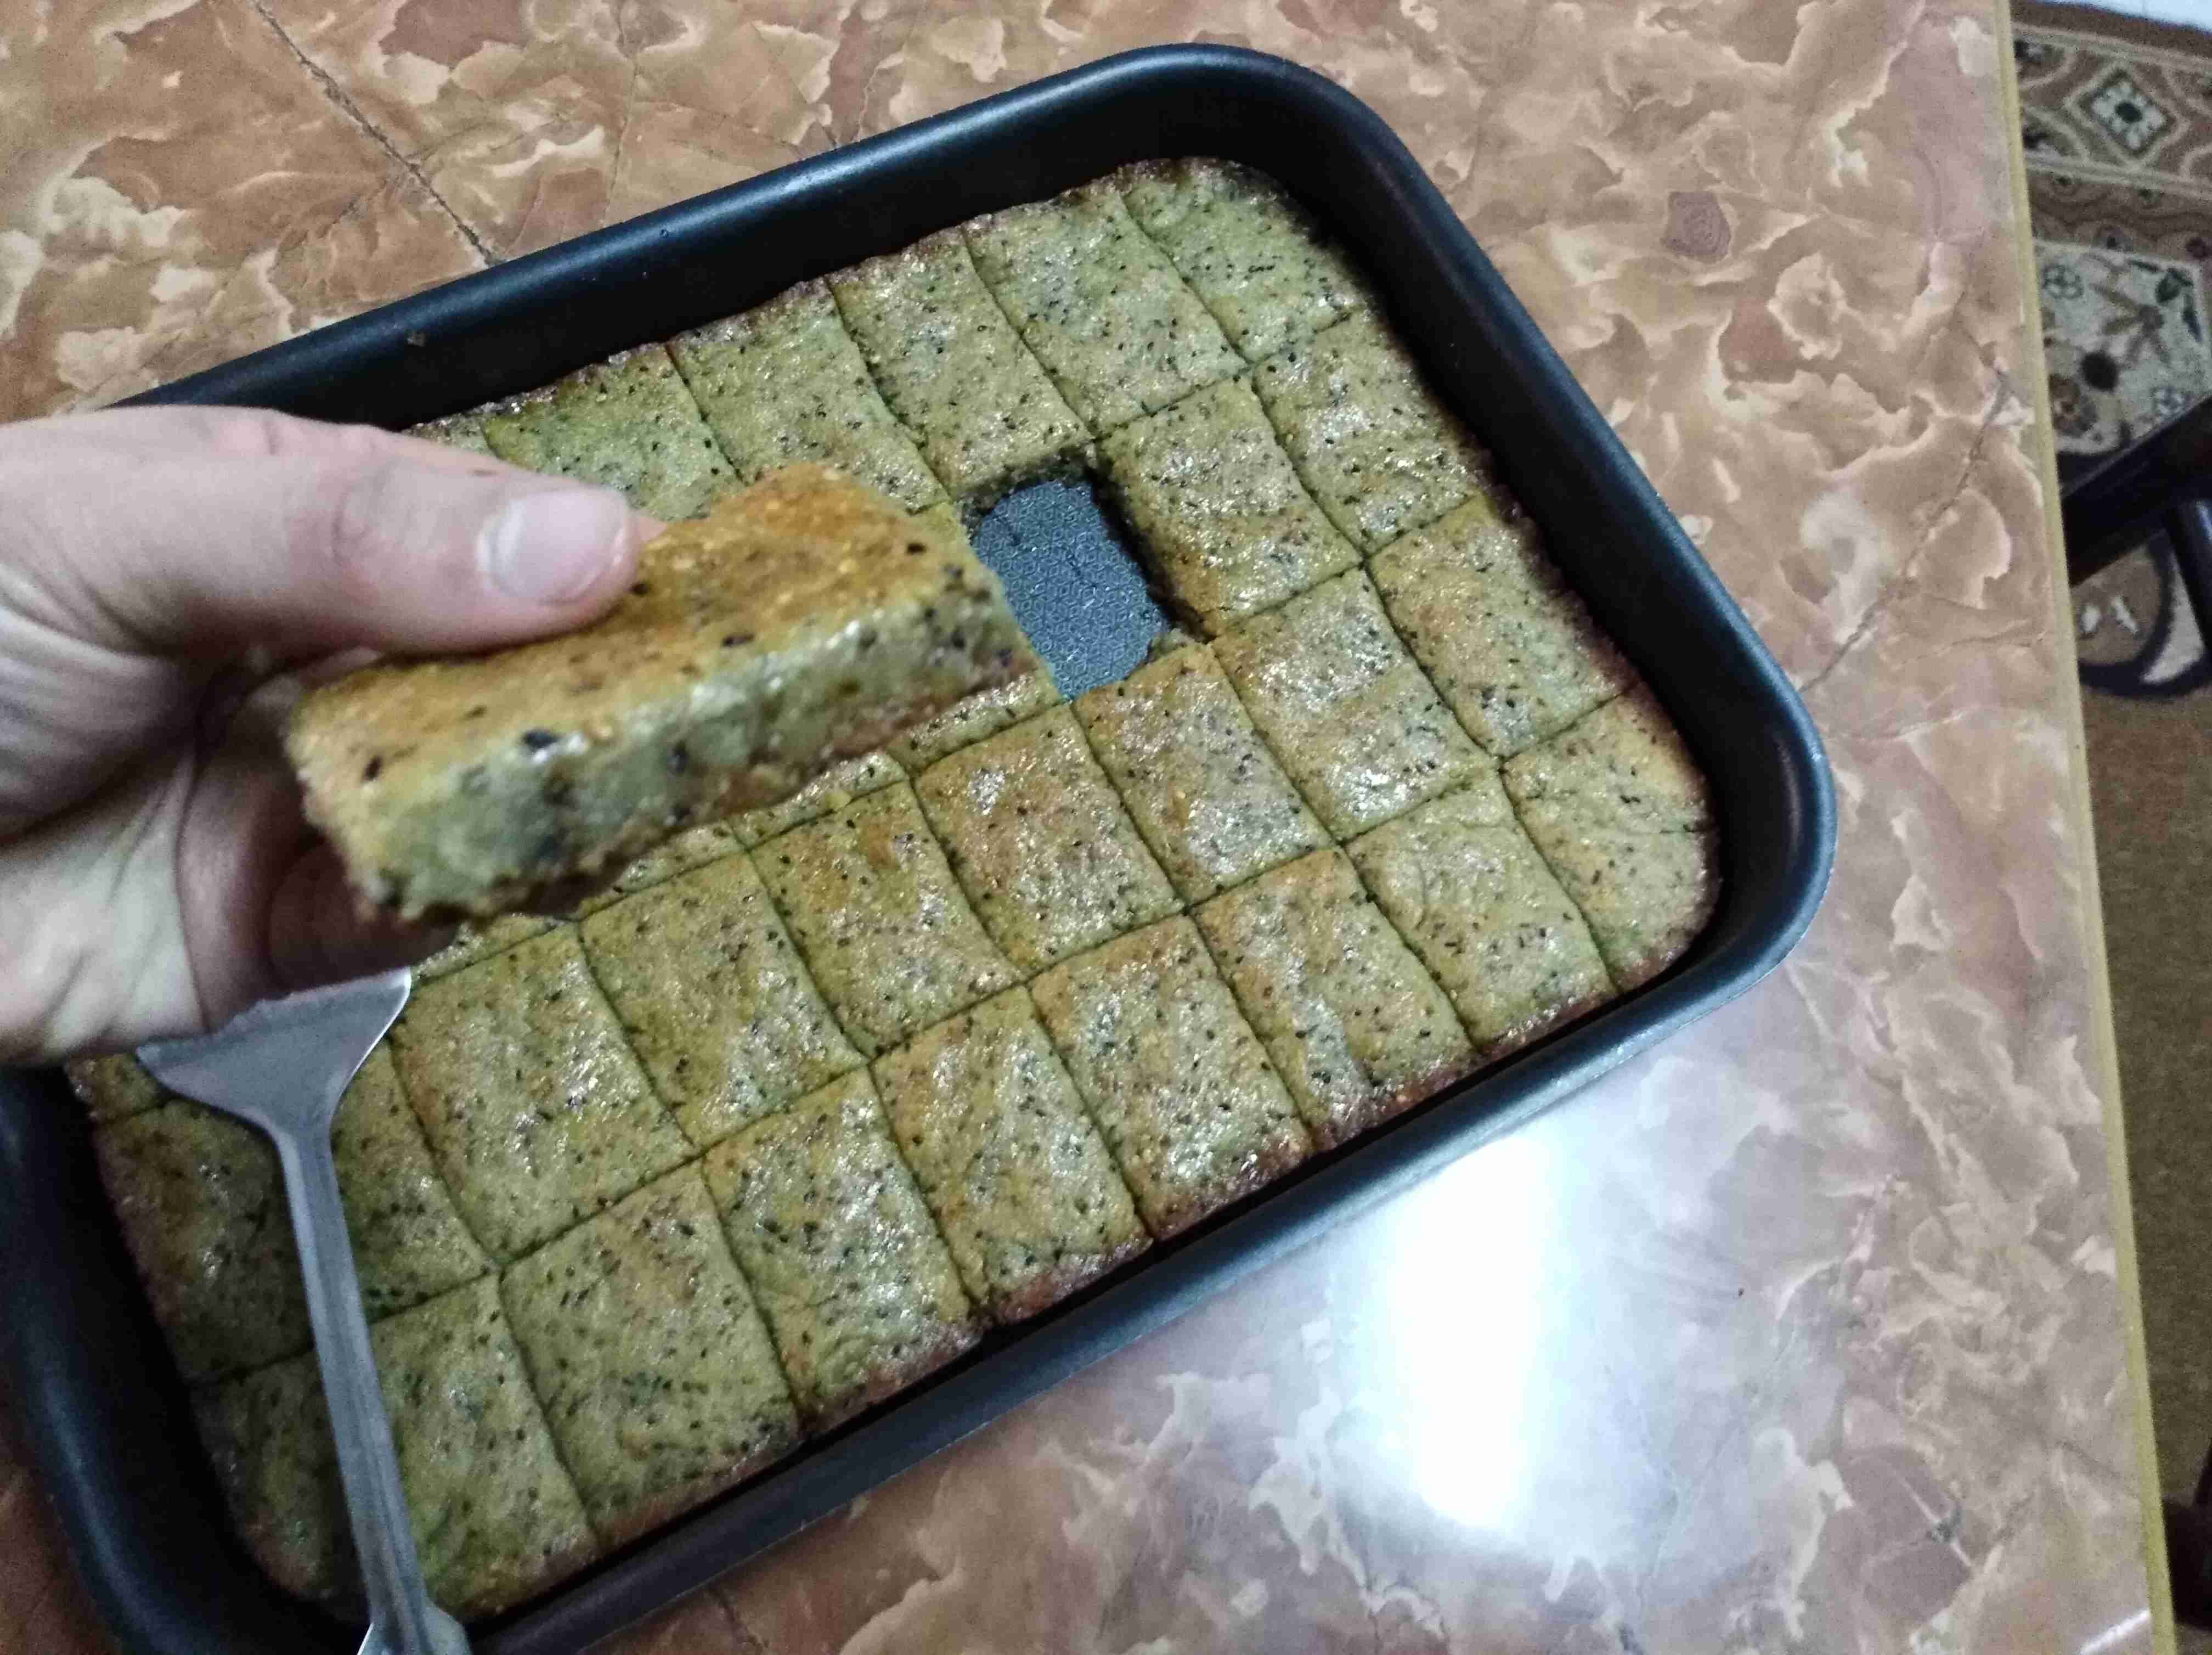 طريقة عمل صينية يانسونيه زاكي Sweets Recipes Arabic Sweets Middle Eastern Desserts